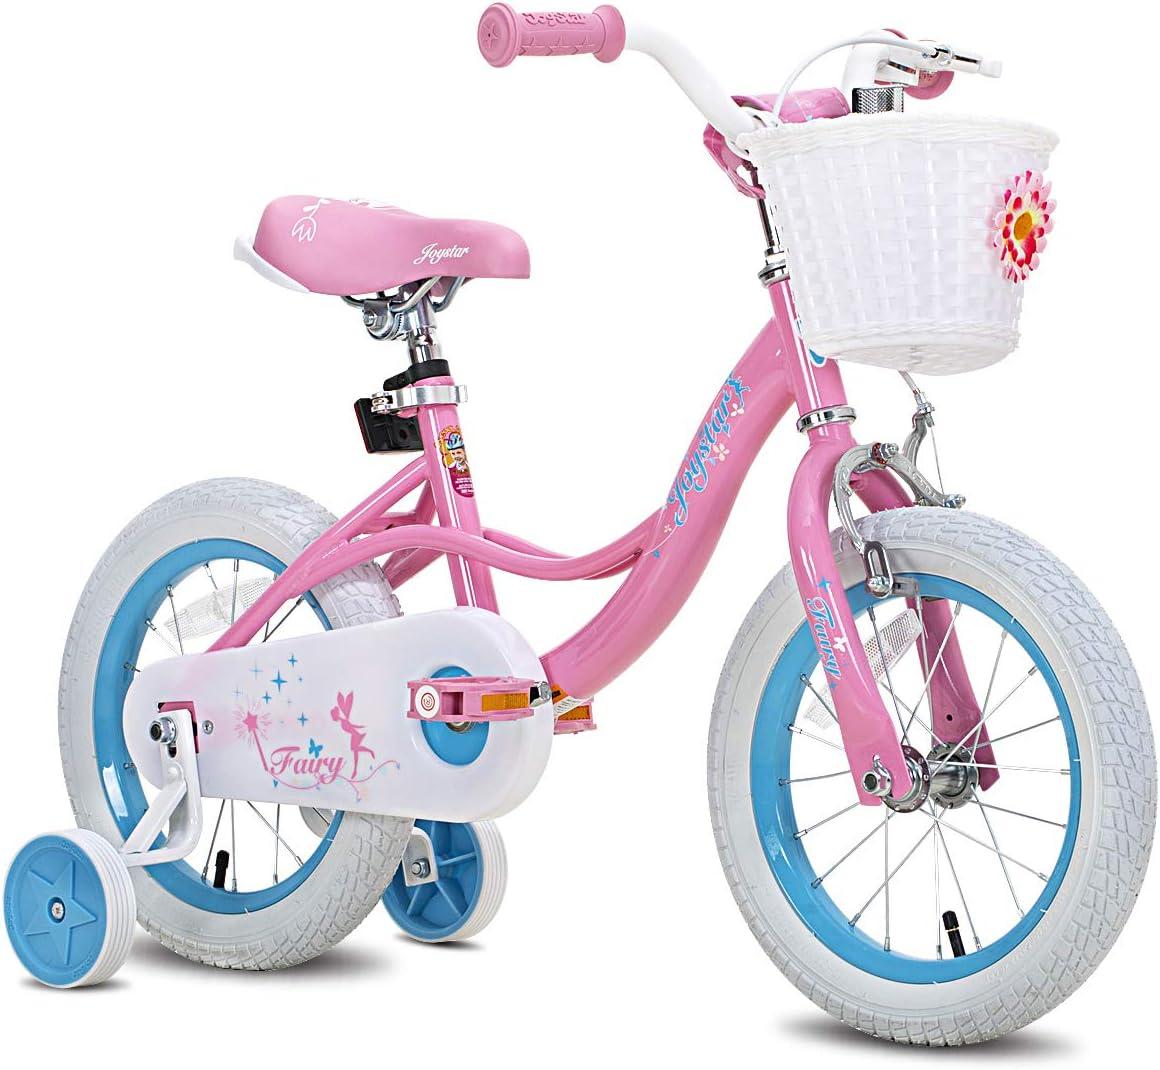 "JOYSTAR Fairy 12"" 14"" 16"" 18"" Inch Kids Bike with Basket & Training Wheels for 2-9 Years Old Girls (Corel & Pink, Purple)"